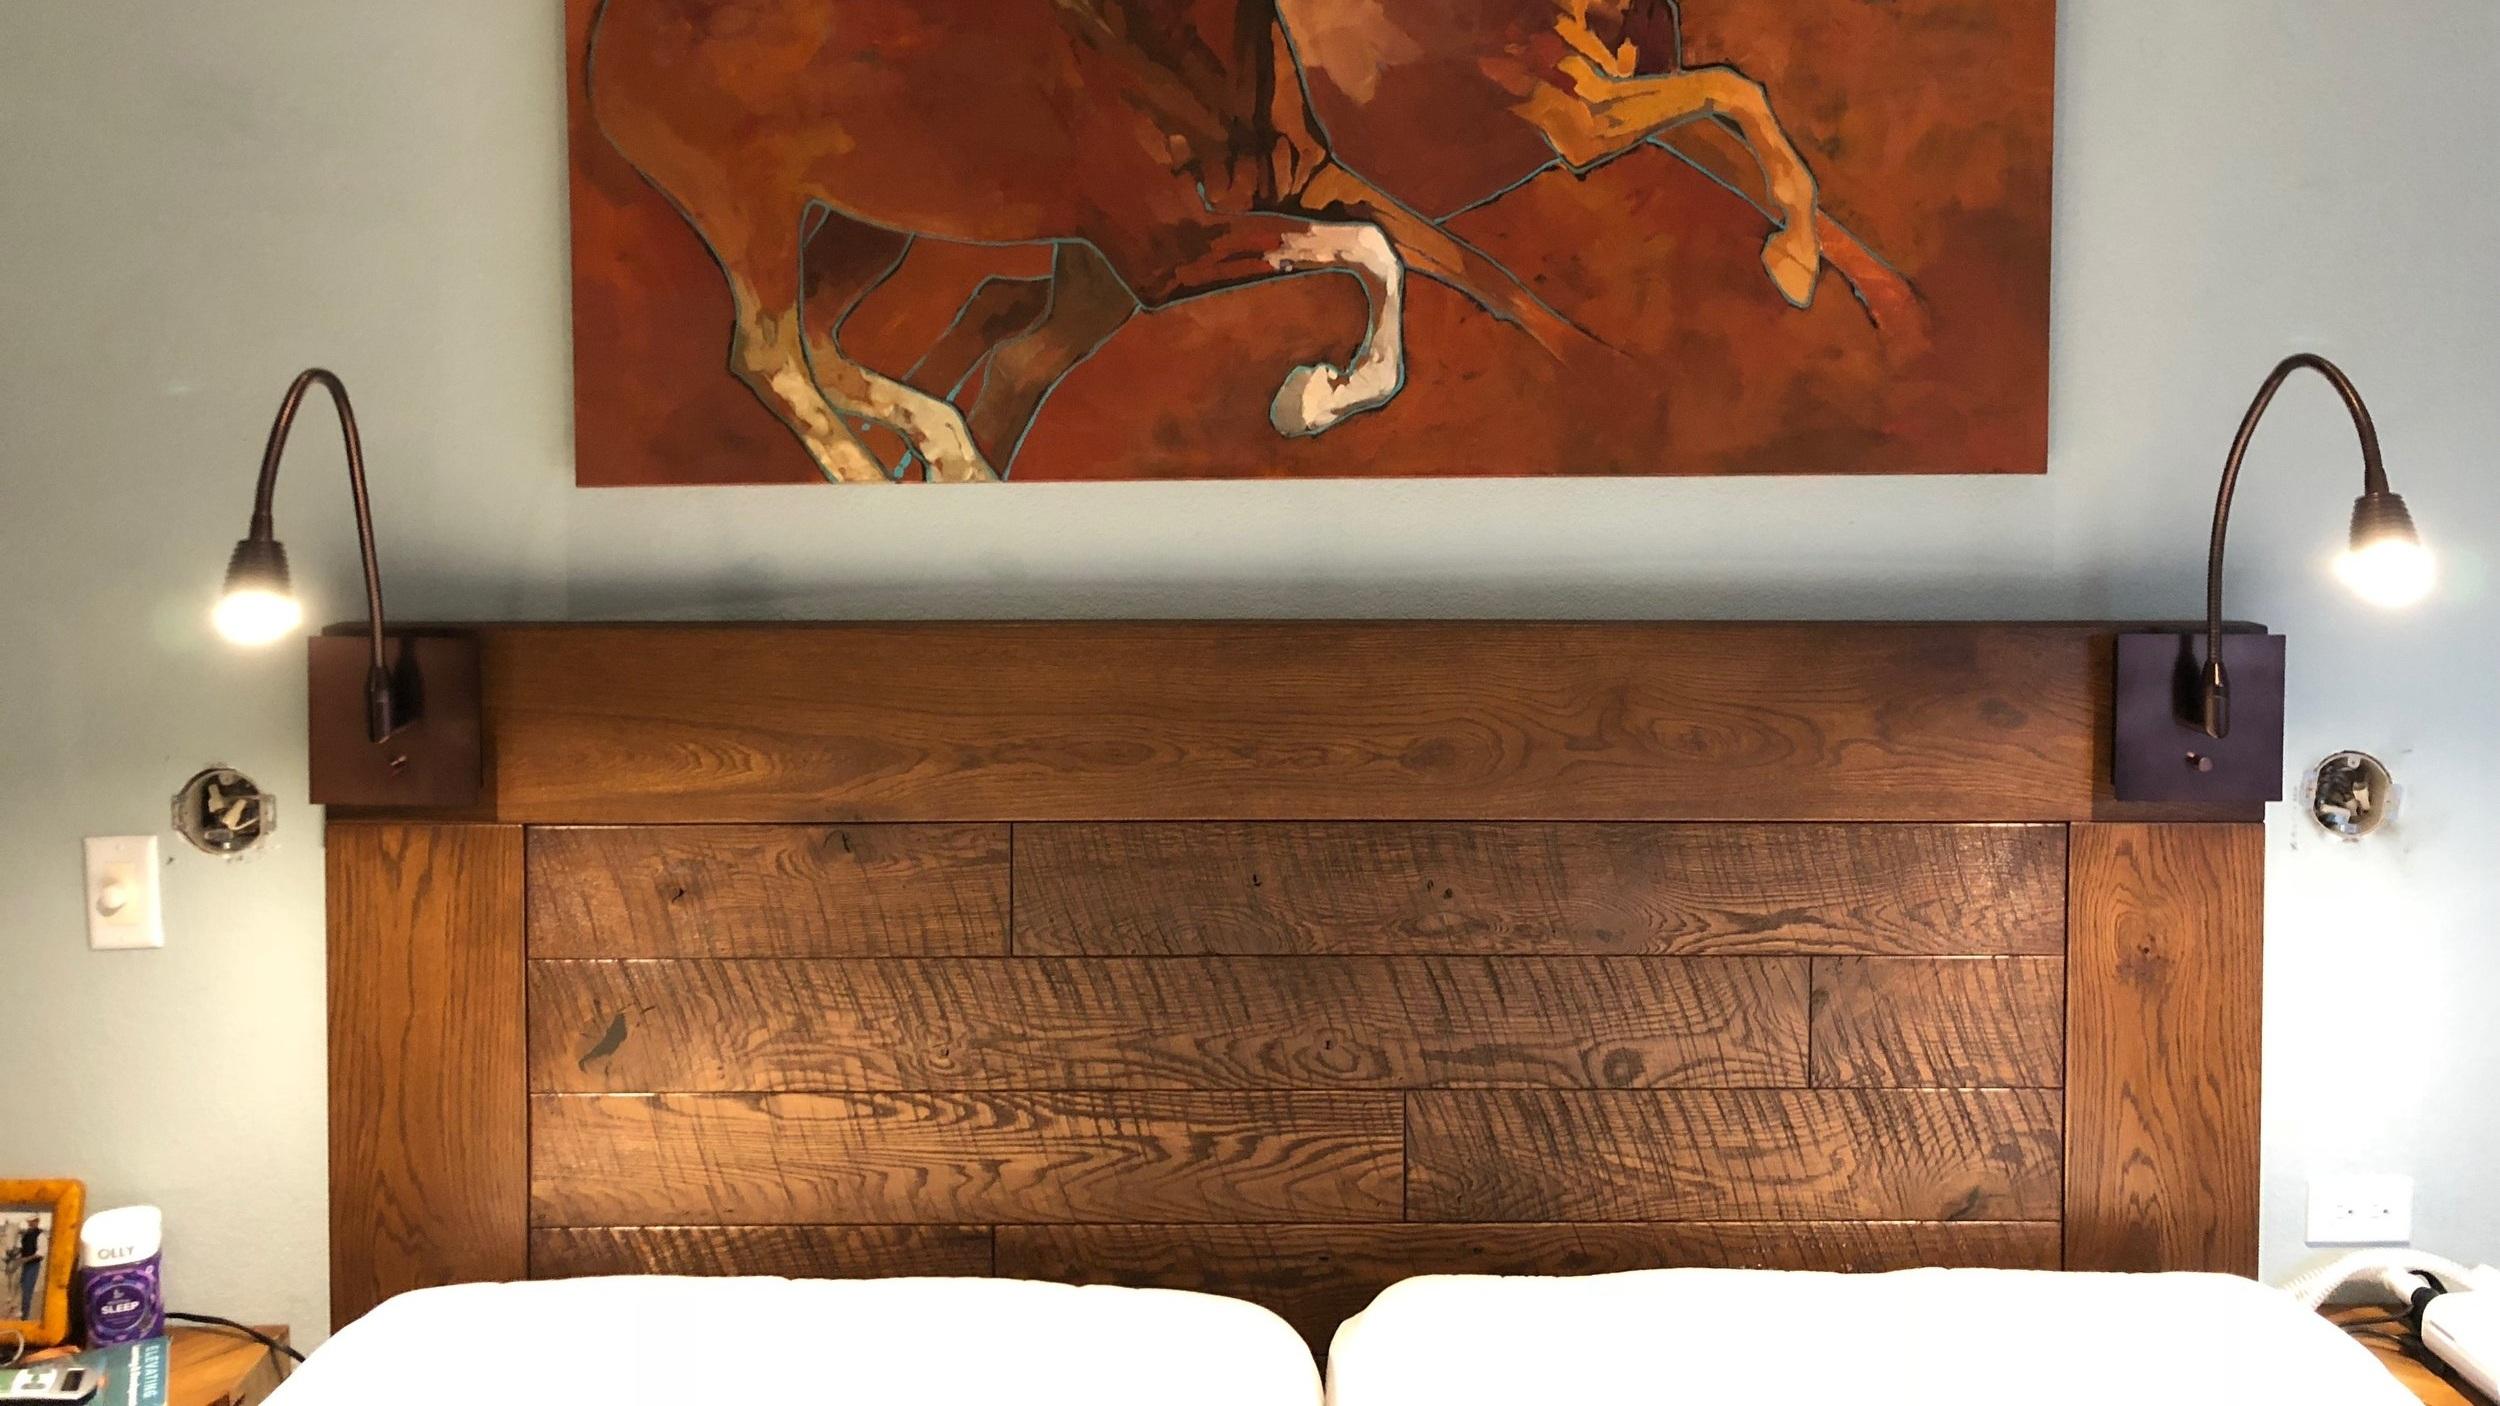 House+of+Alpine+Rustic+White+Oak+Bed+Frame+Headboard.jpg